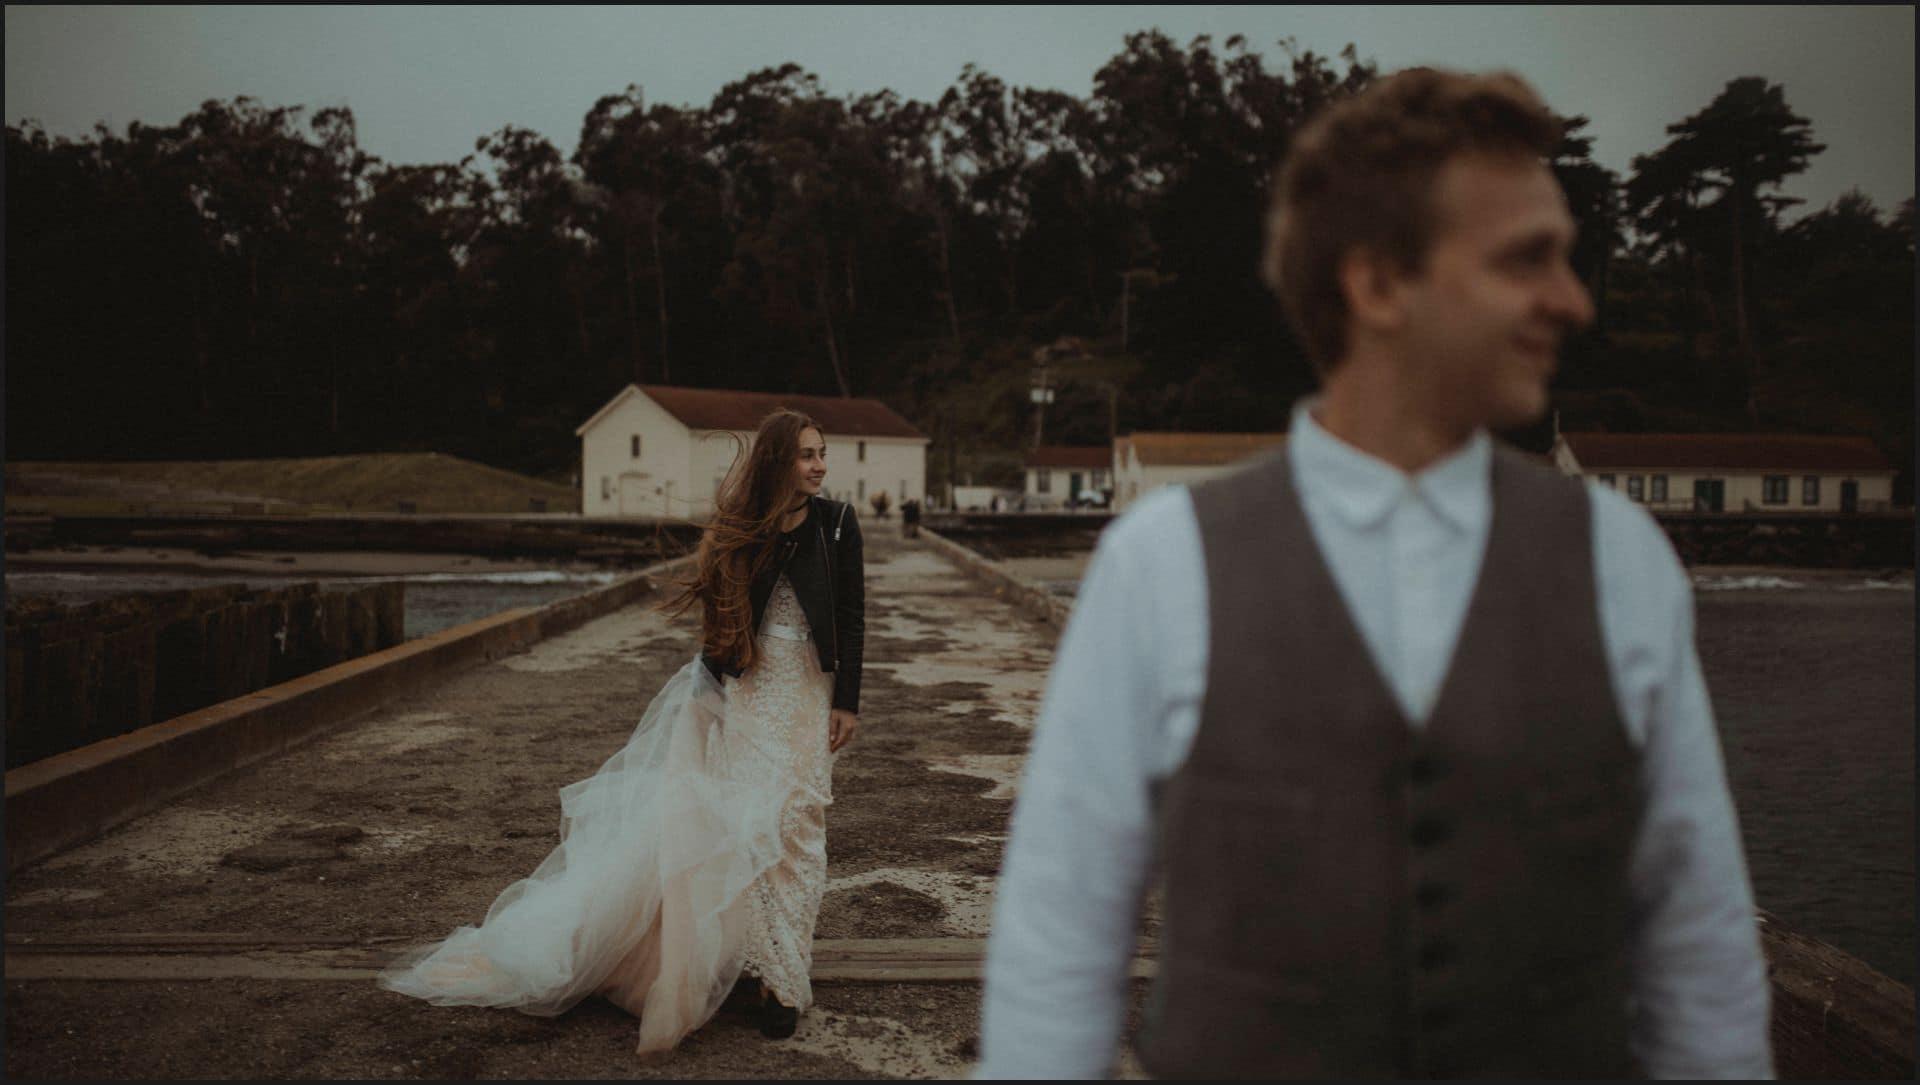 san francisco, california, elopement wedding, first look. bride, groom